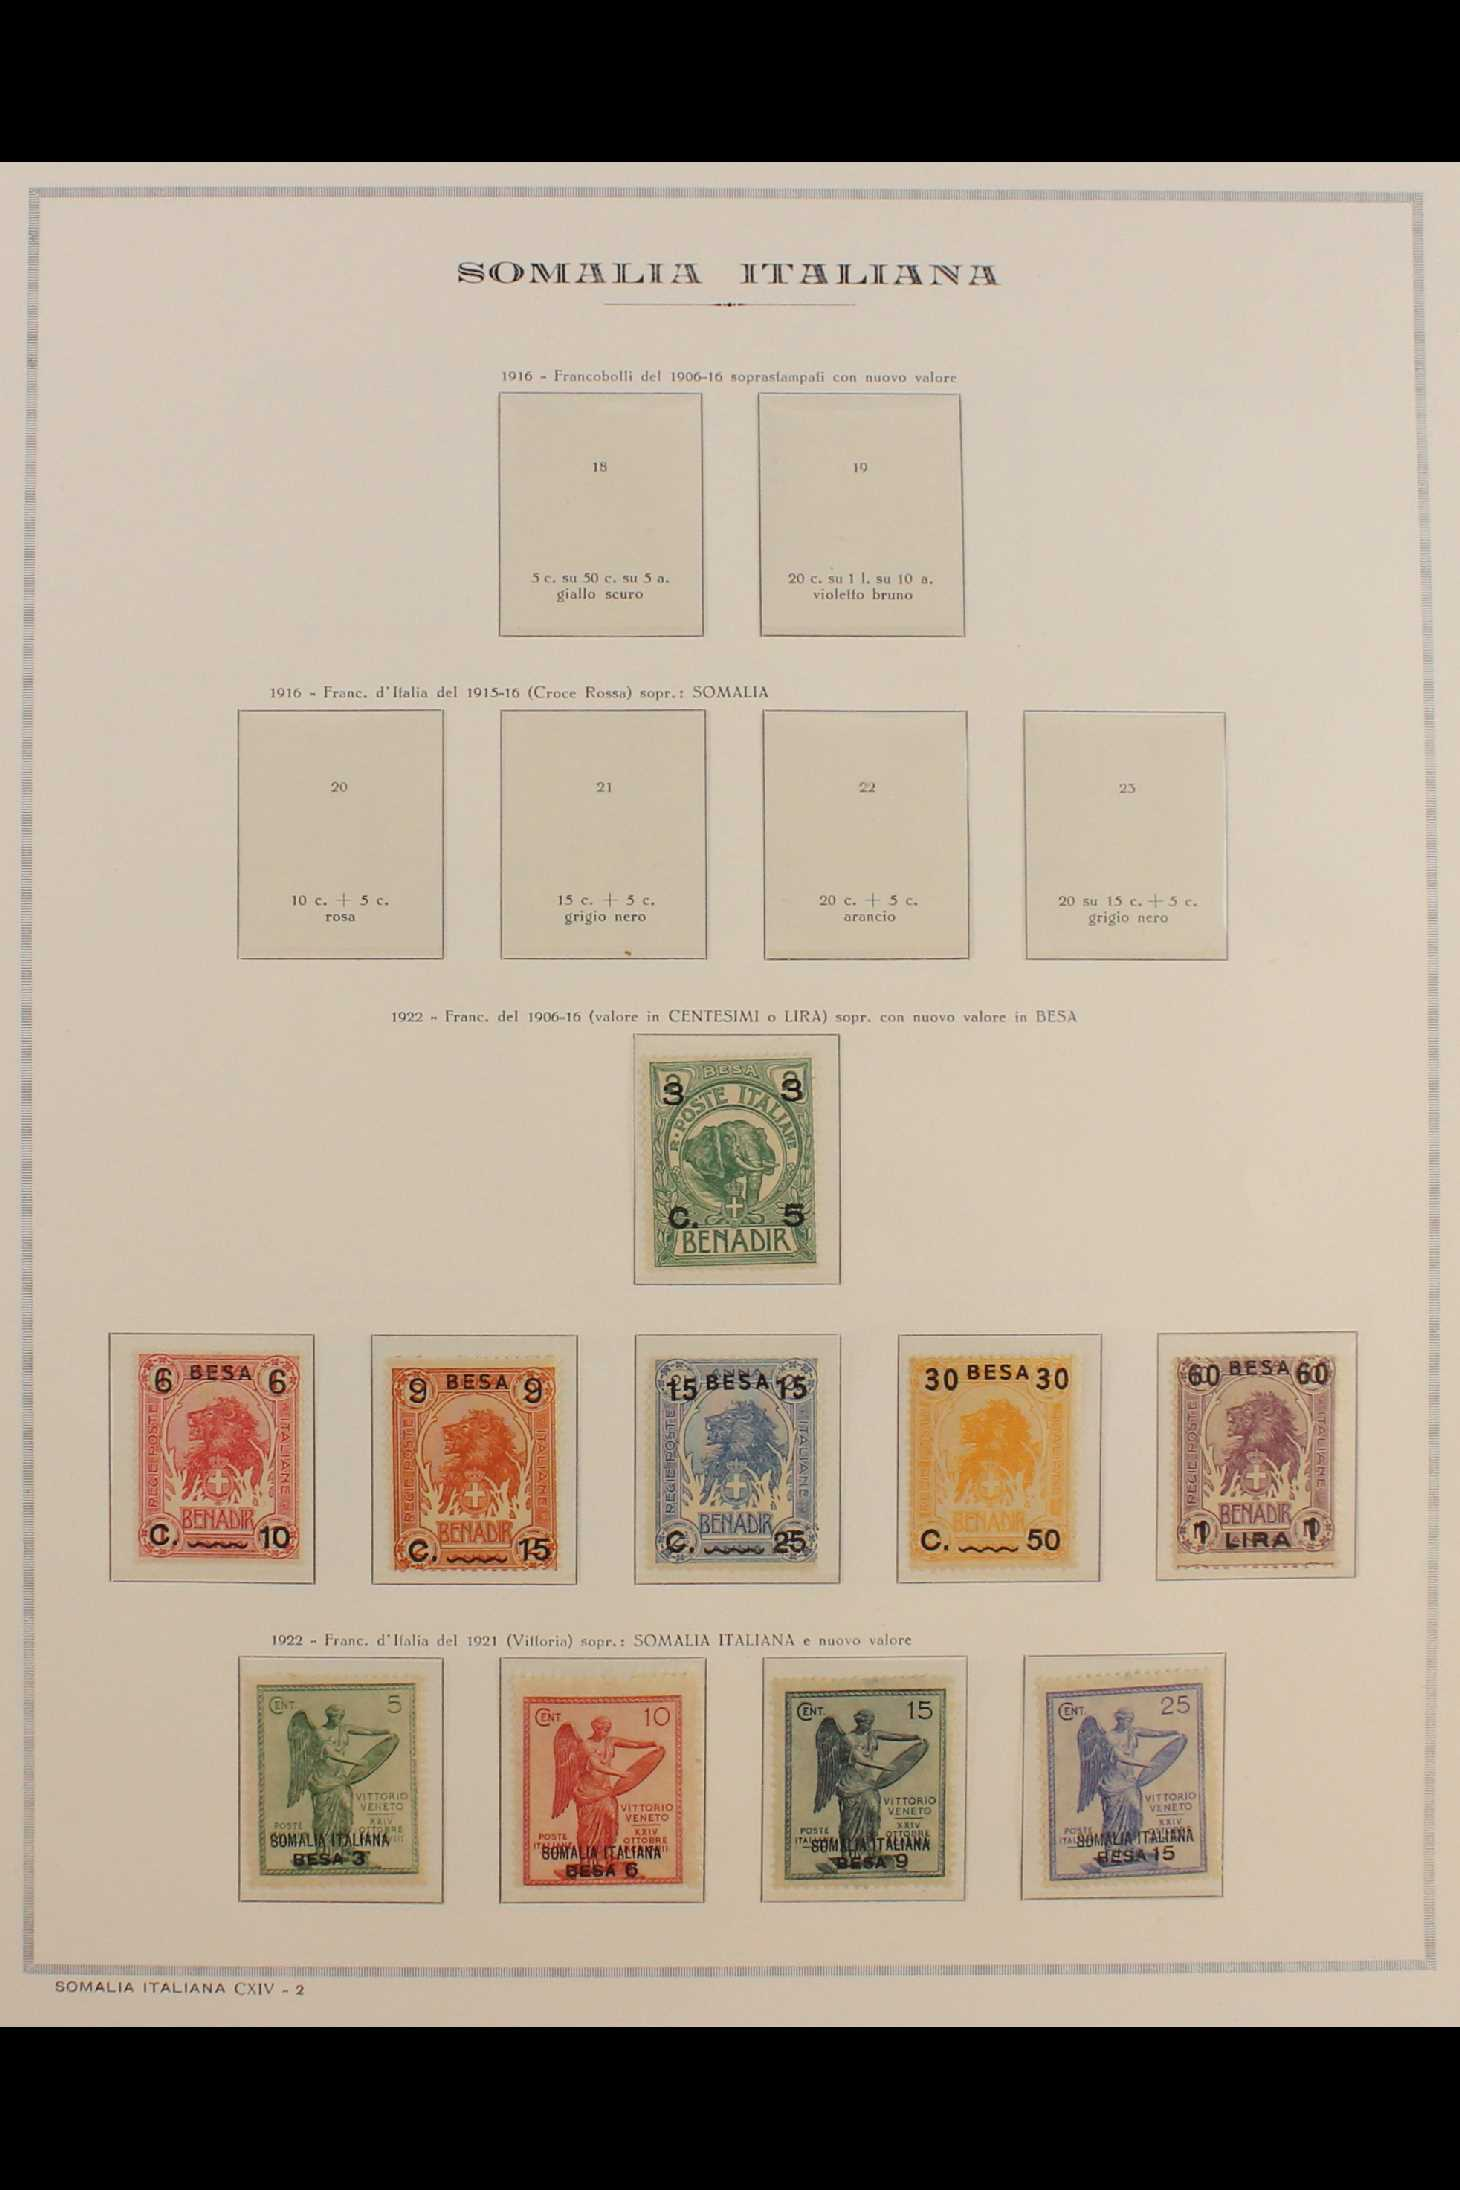 ITALIAN COLONIES SOMALIA 1922-1940 fine mint collection incl.1922 surcharged set, 1923 Fide set NHM,